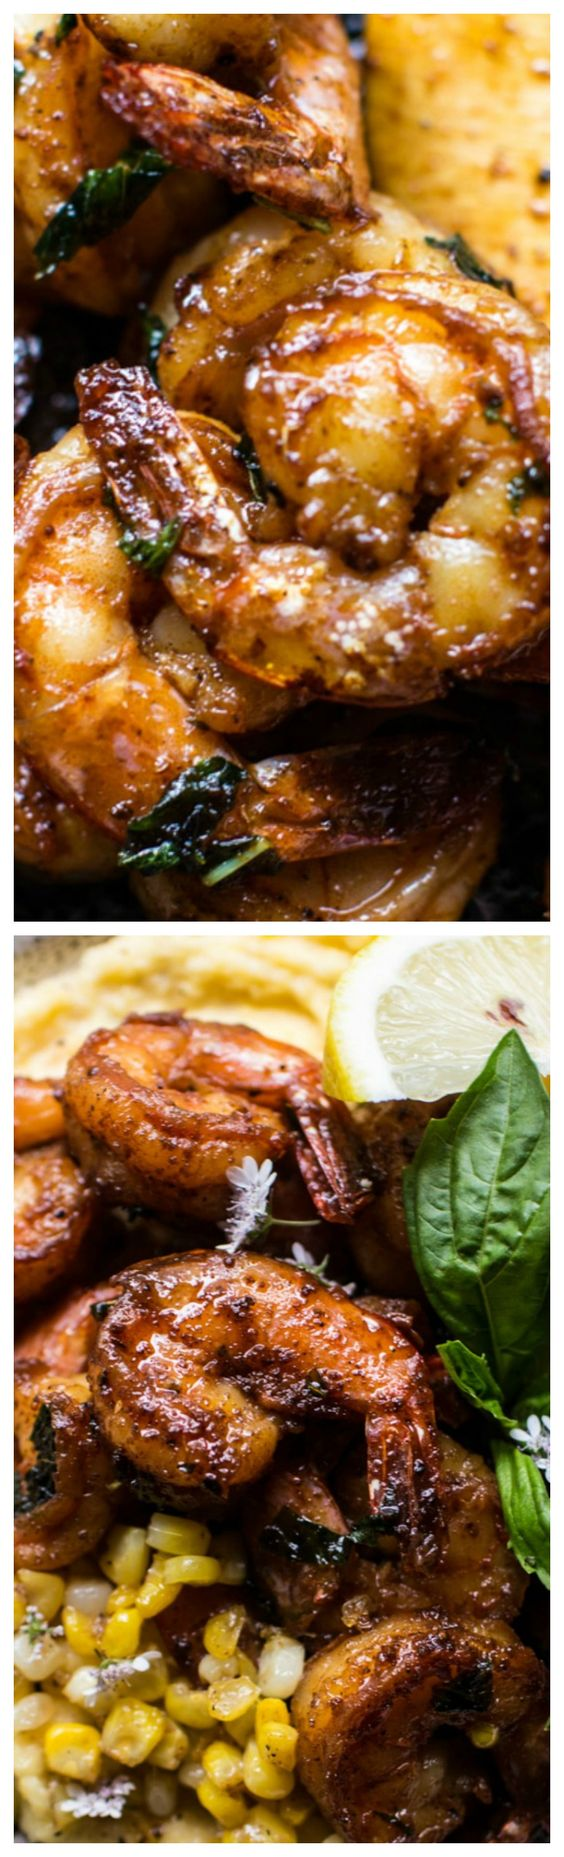 Cajun Garlic Lemon Butter Shrimp with Caramelized Corn Polenta ~ Totally delish!